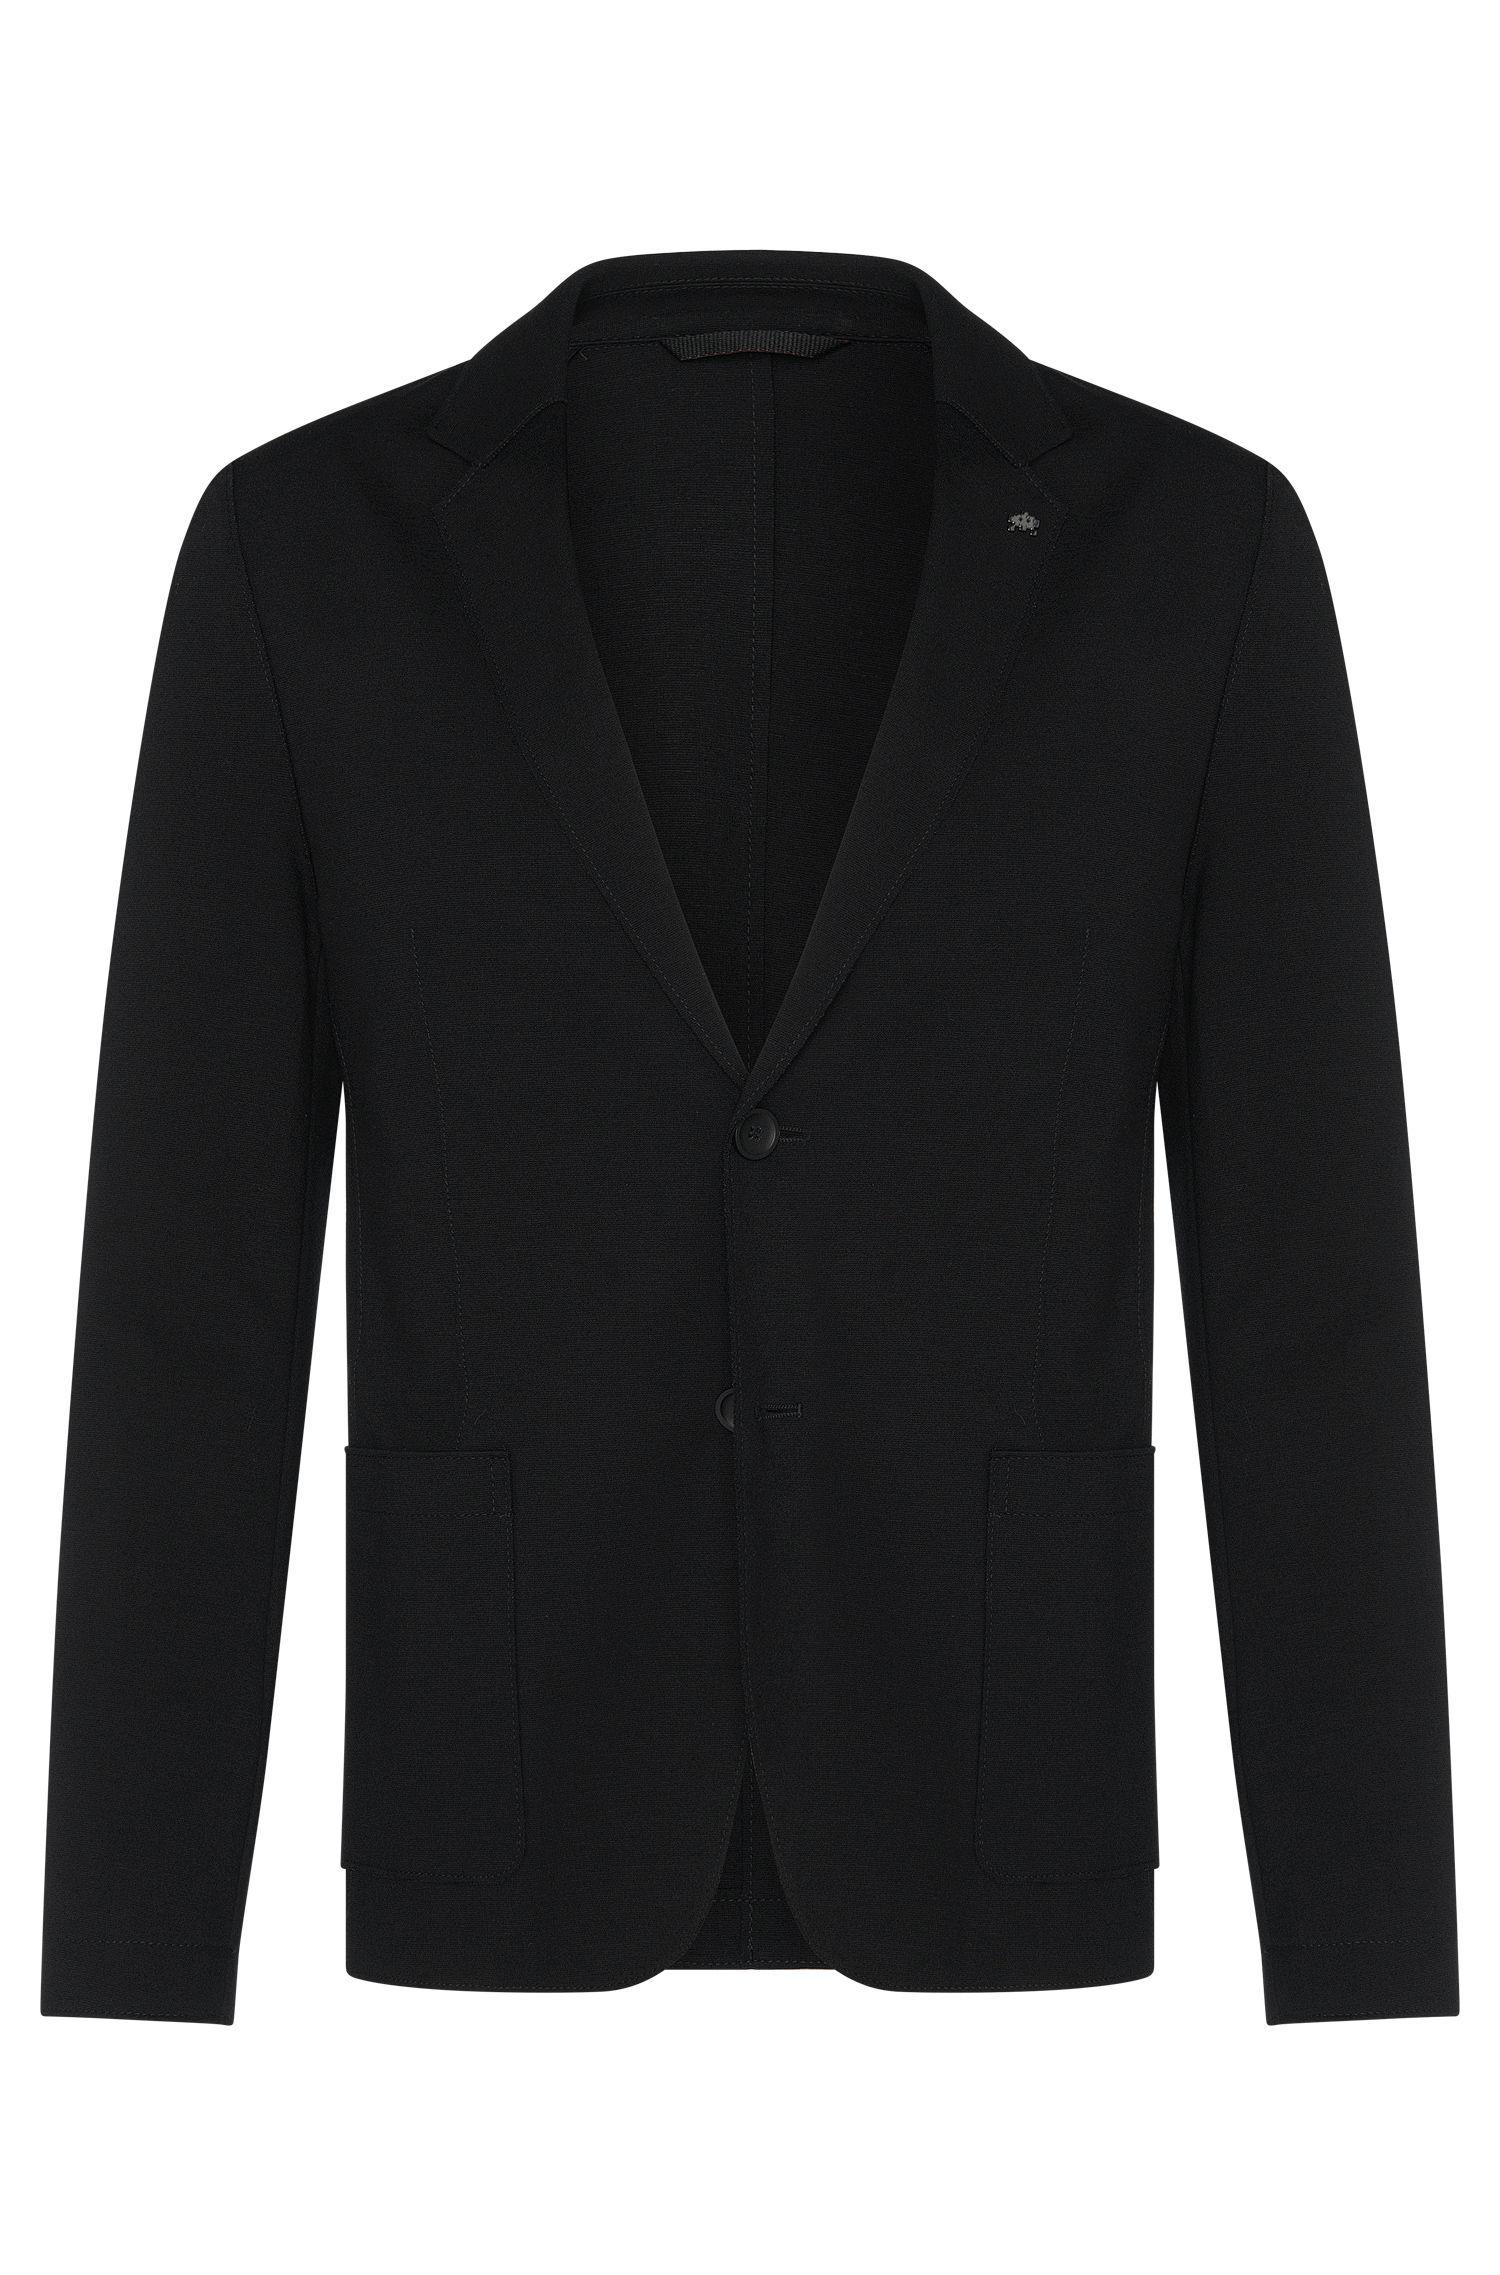 'Agalto' | Slim Fit, Stretch Jersey Sport Coat